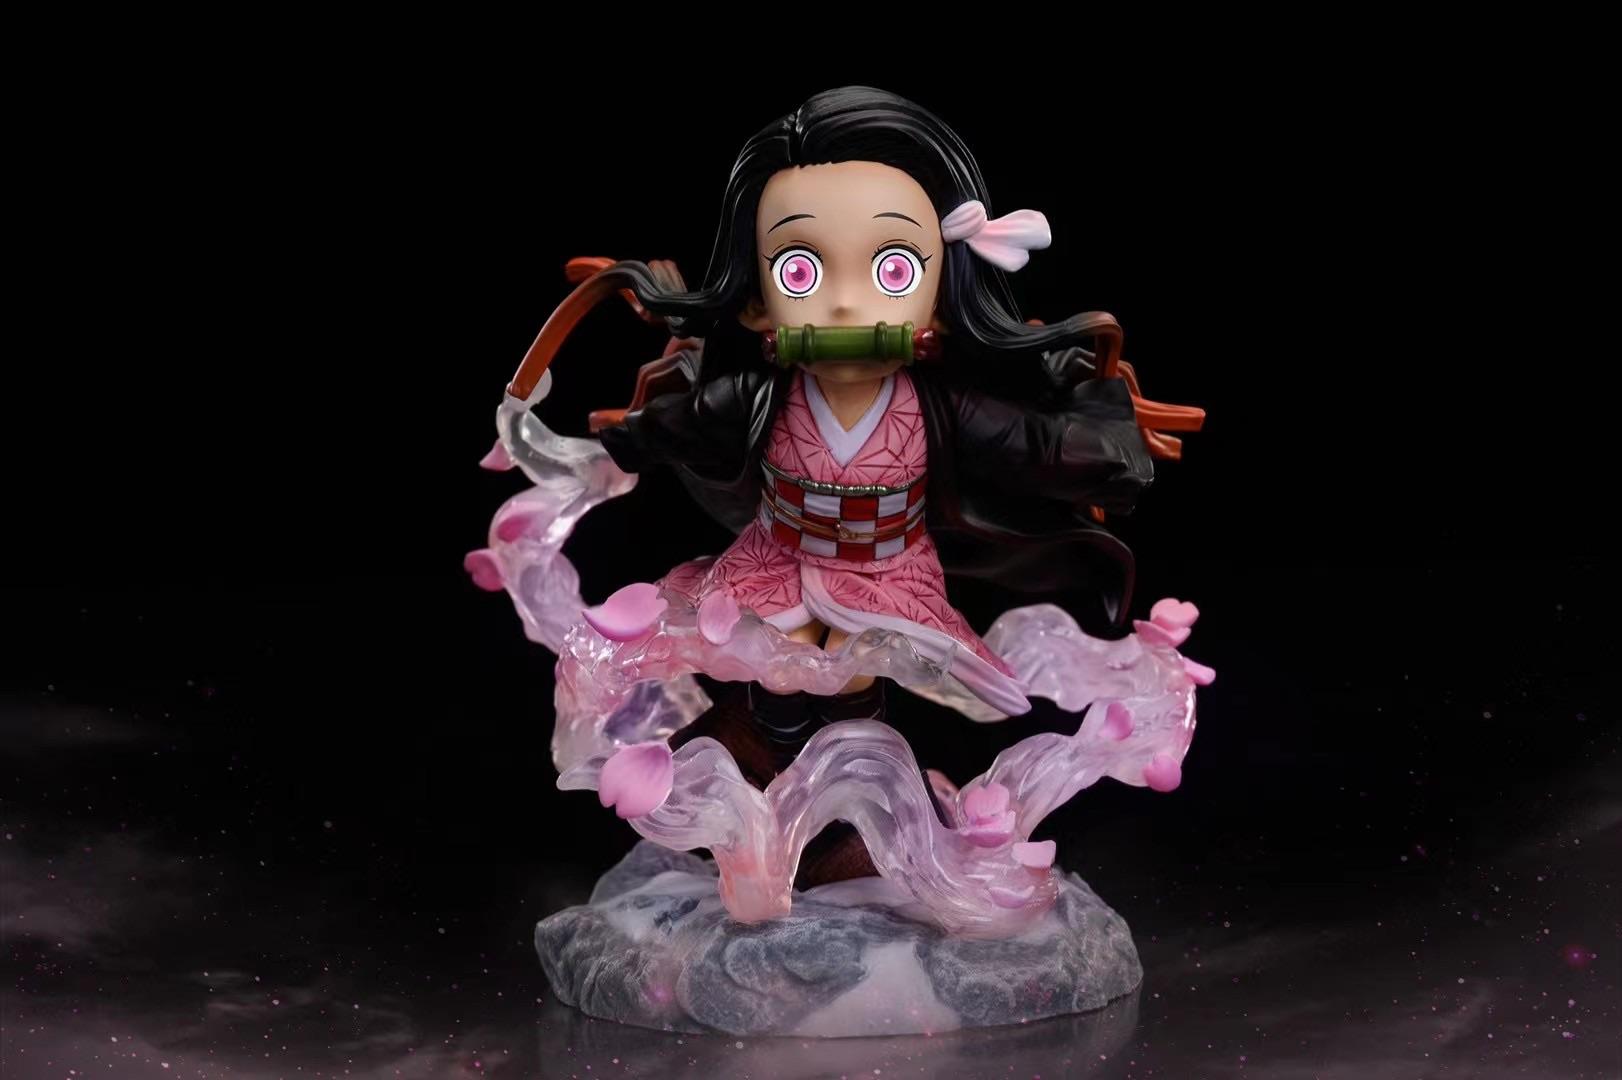 Mini Nezuko น้อง เนซึโกะ  G5 Studio (มัดจำ)